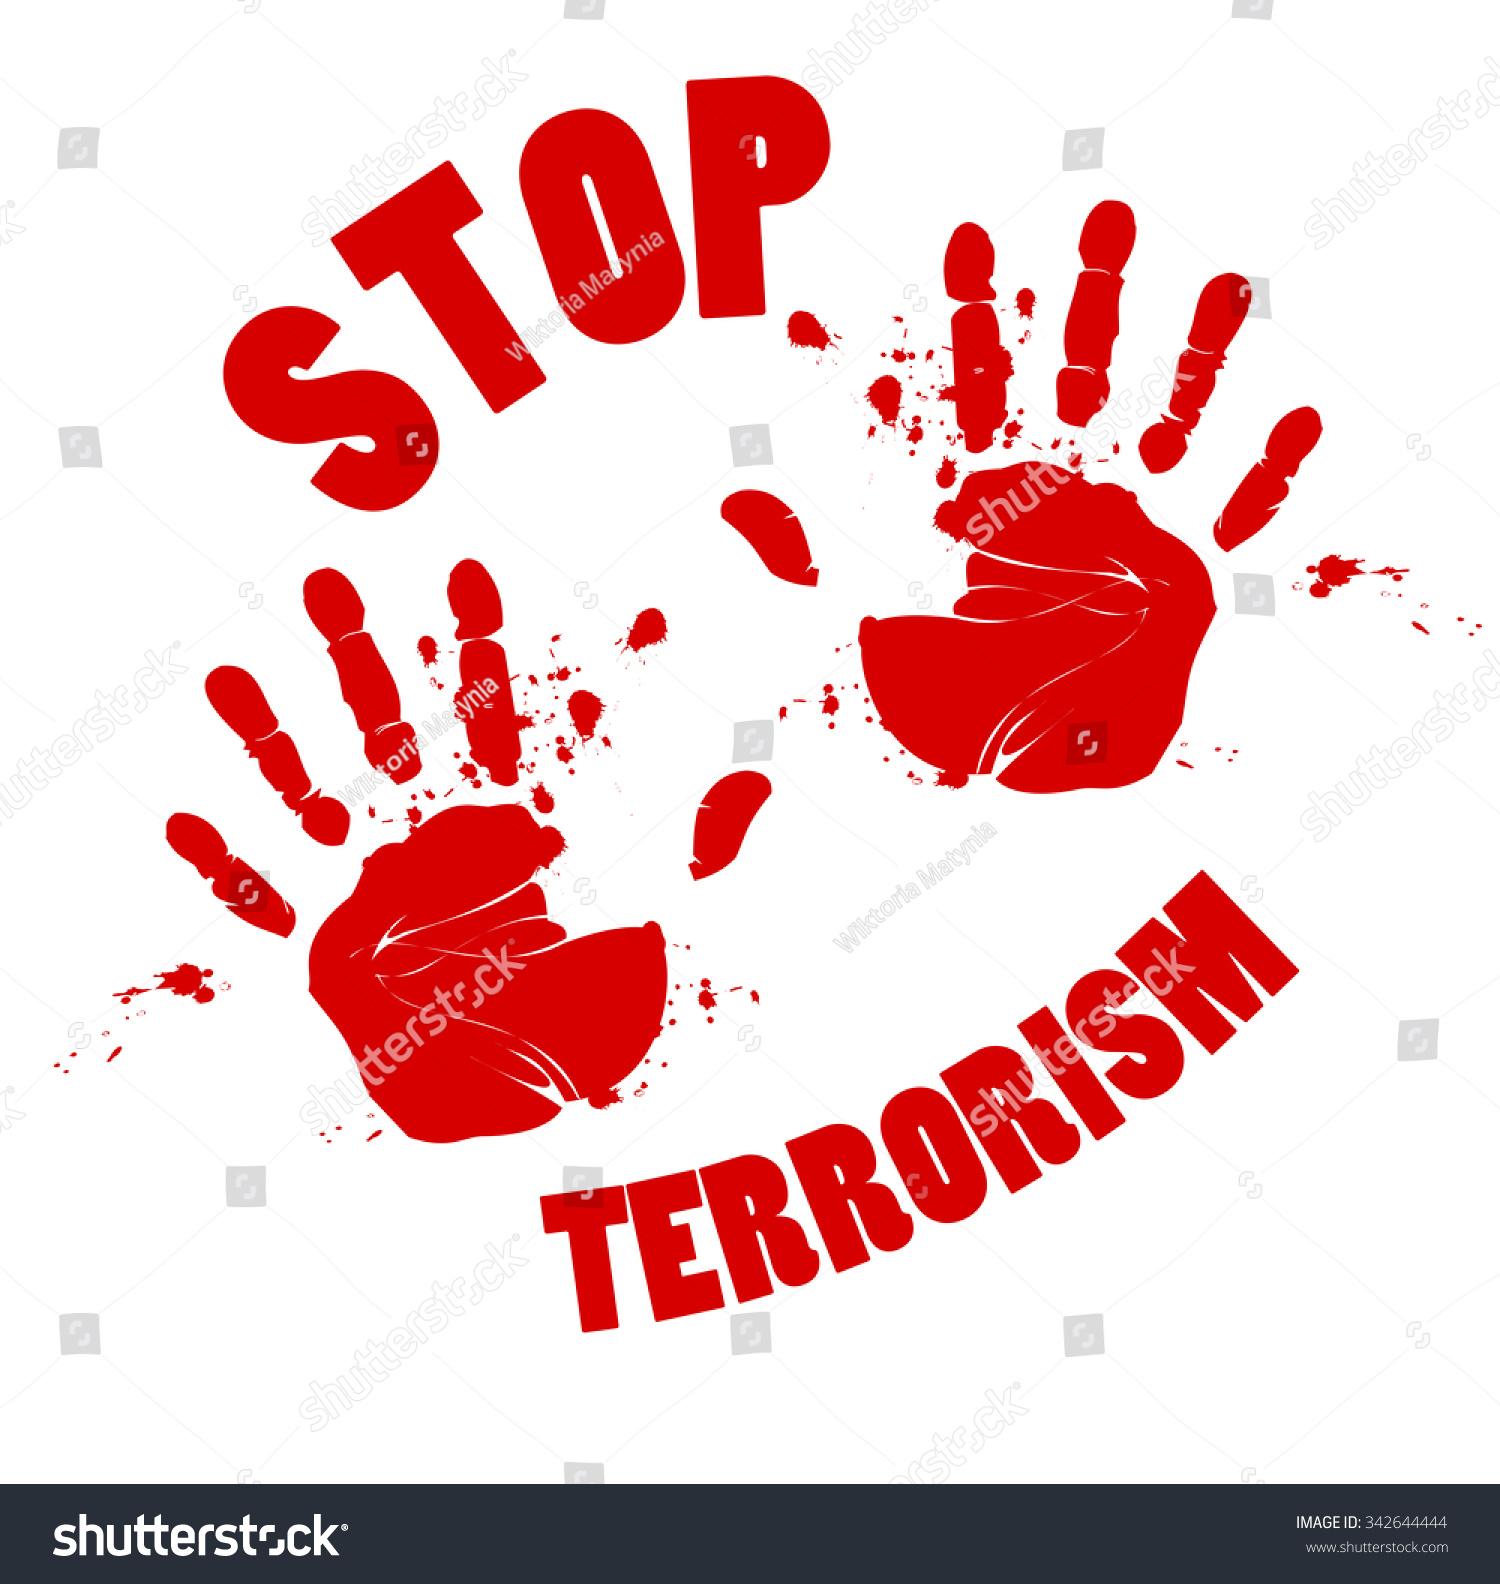 How to stop terrorism